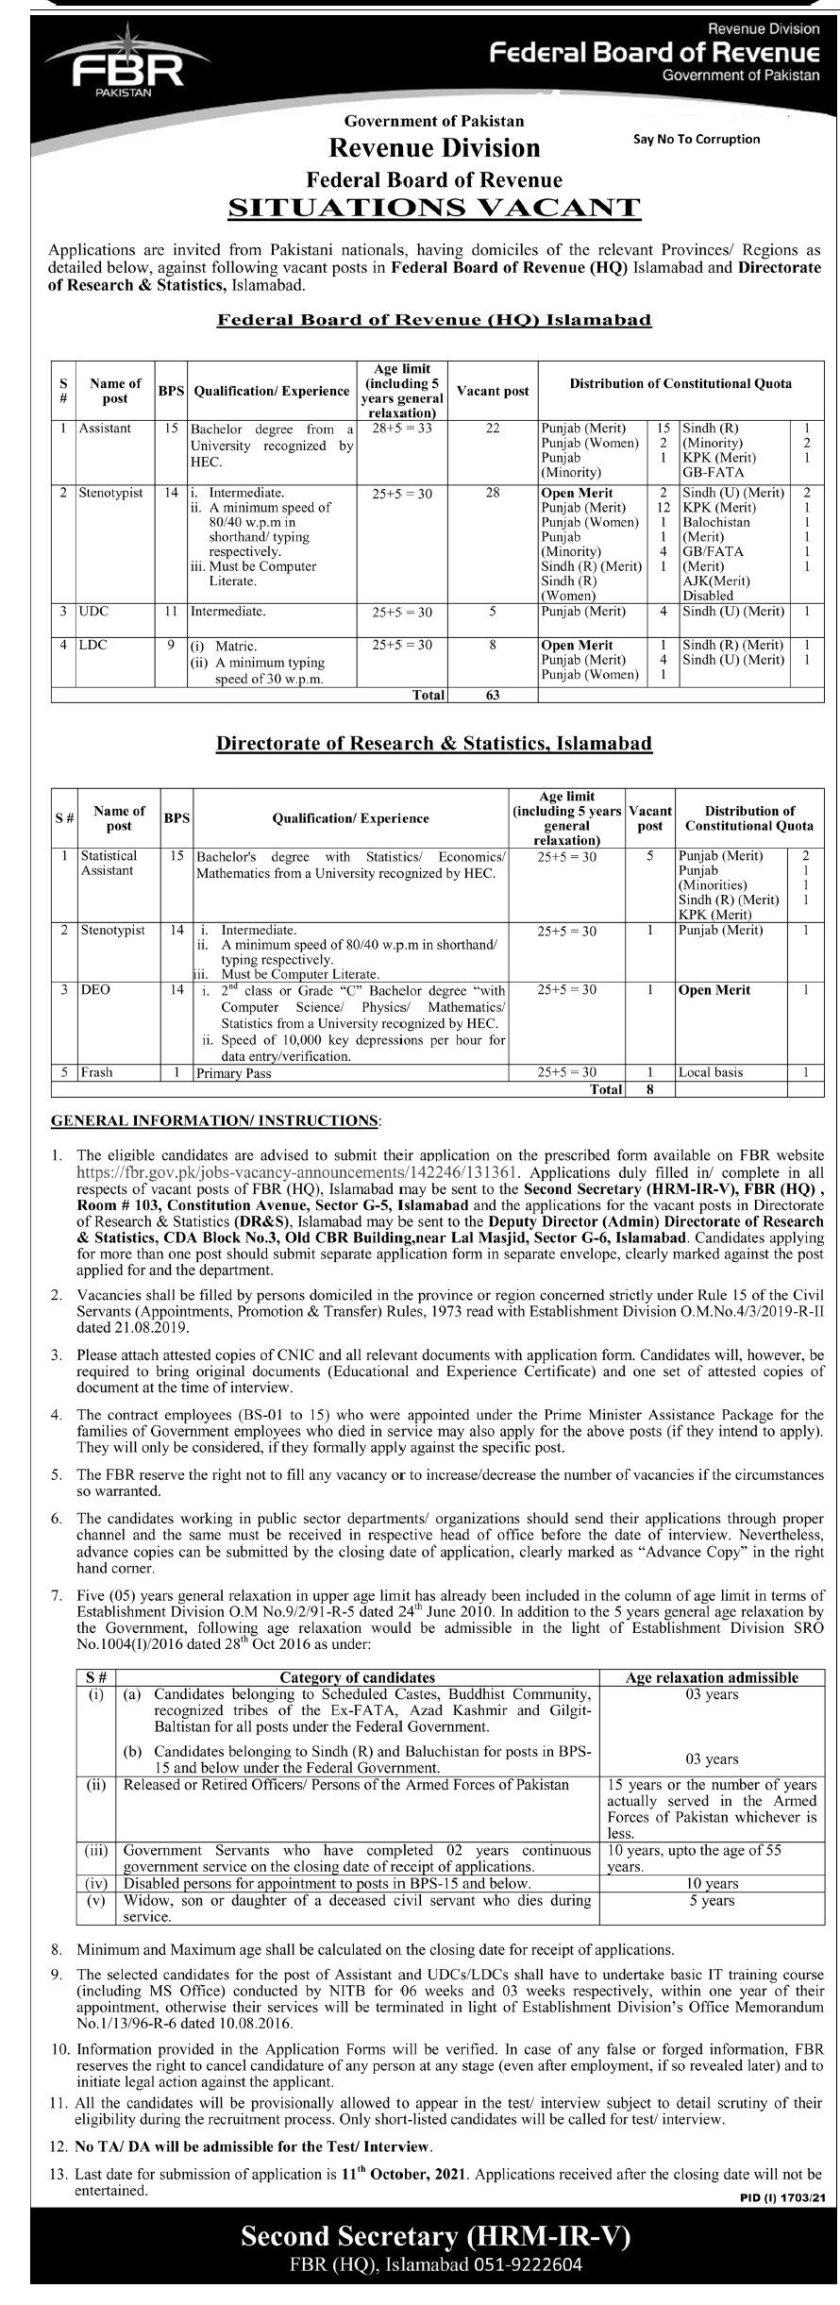 Federal Board of Revenue FBR Jobs 2021